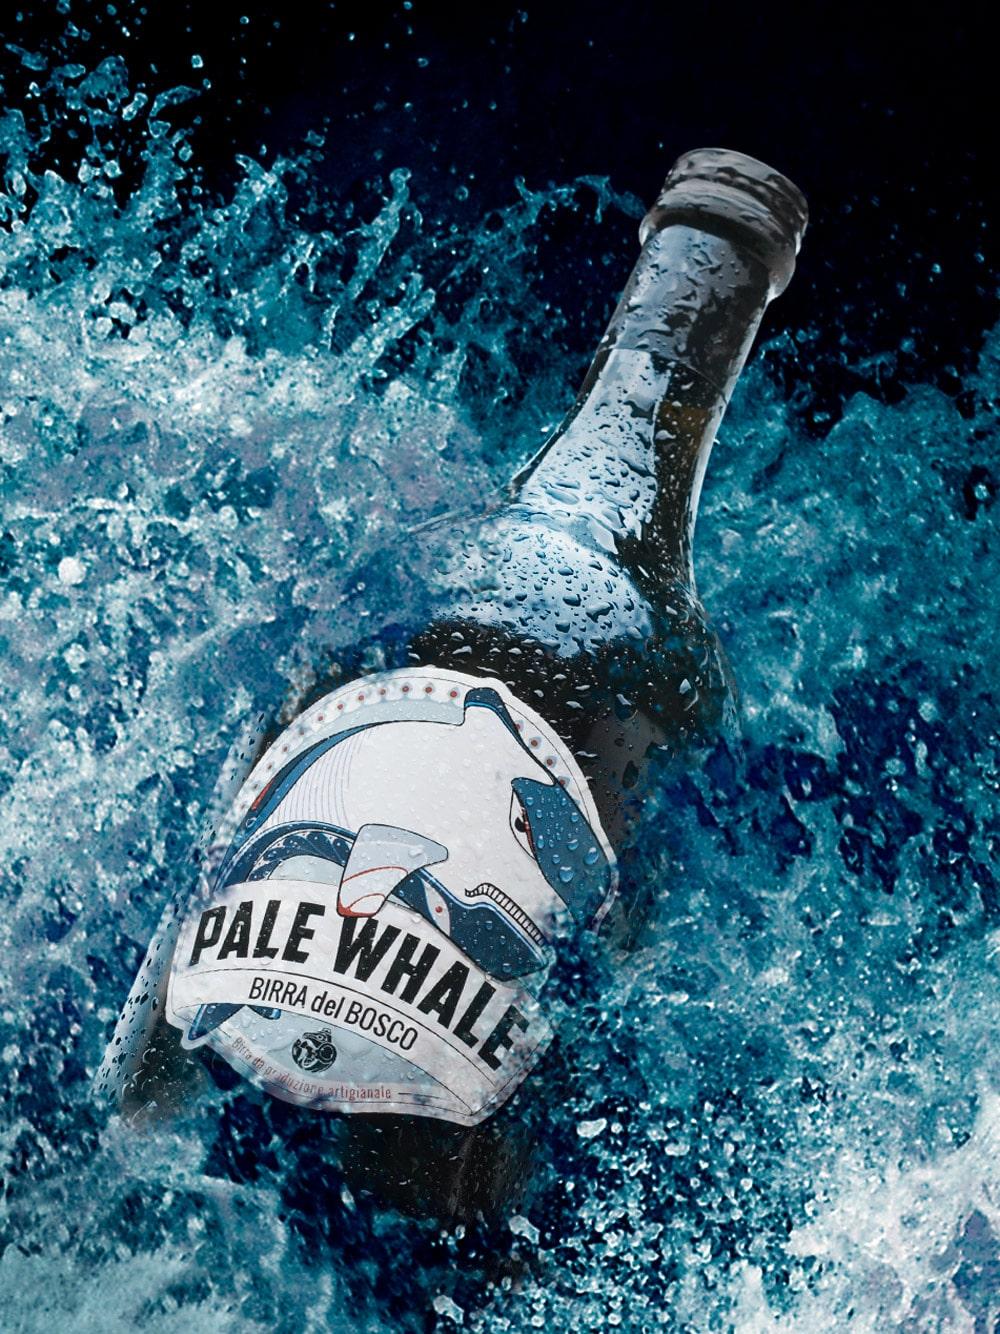 Pale-Whale